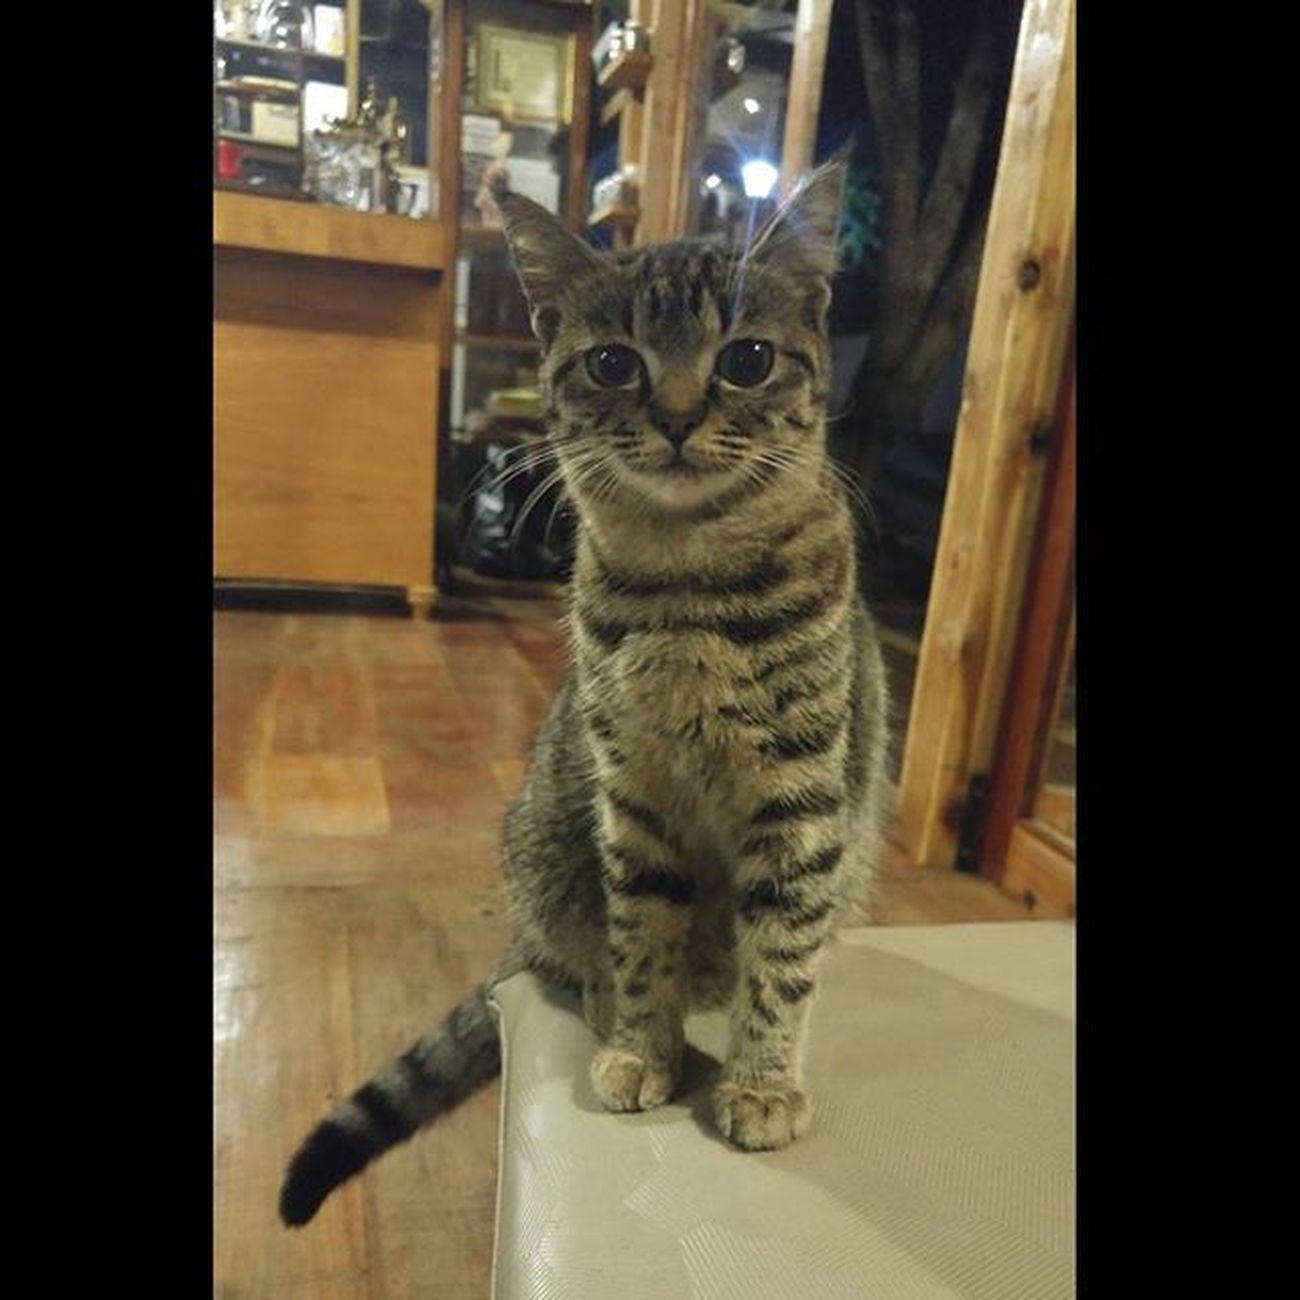 Animal Animallovers Cat Val  2016 LG  G4 LGG4 😚